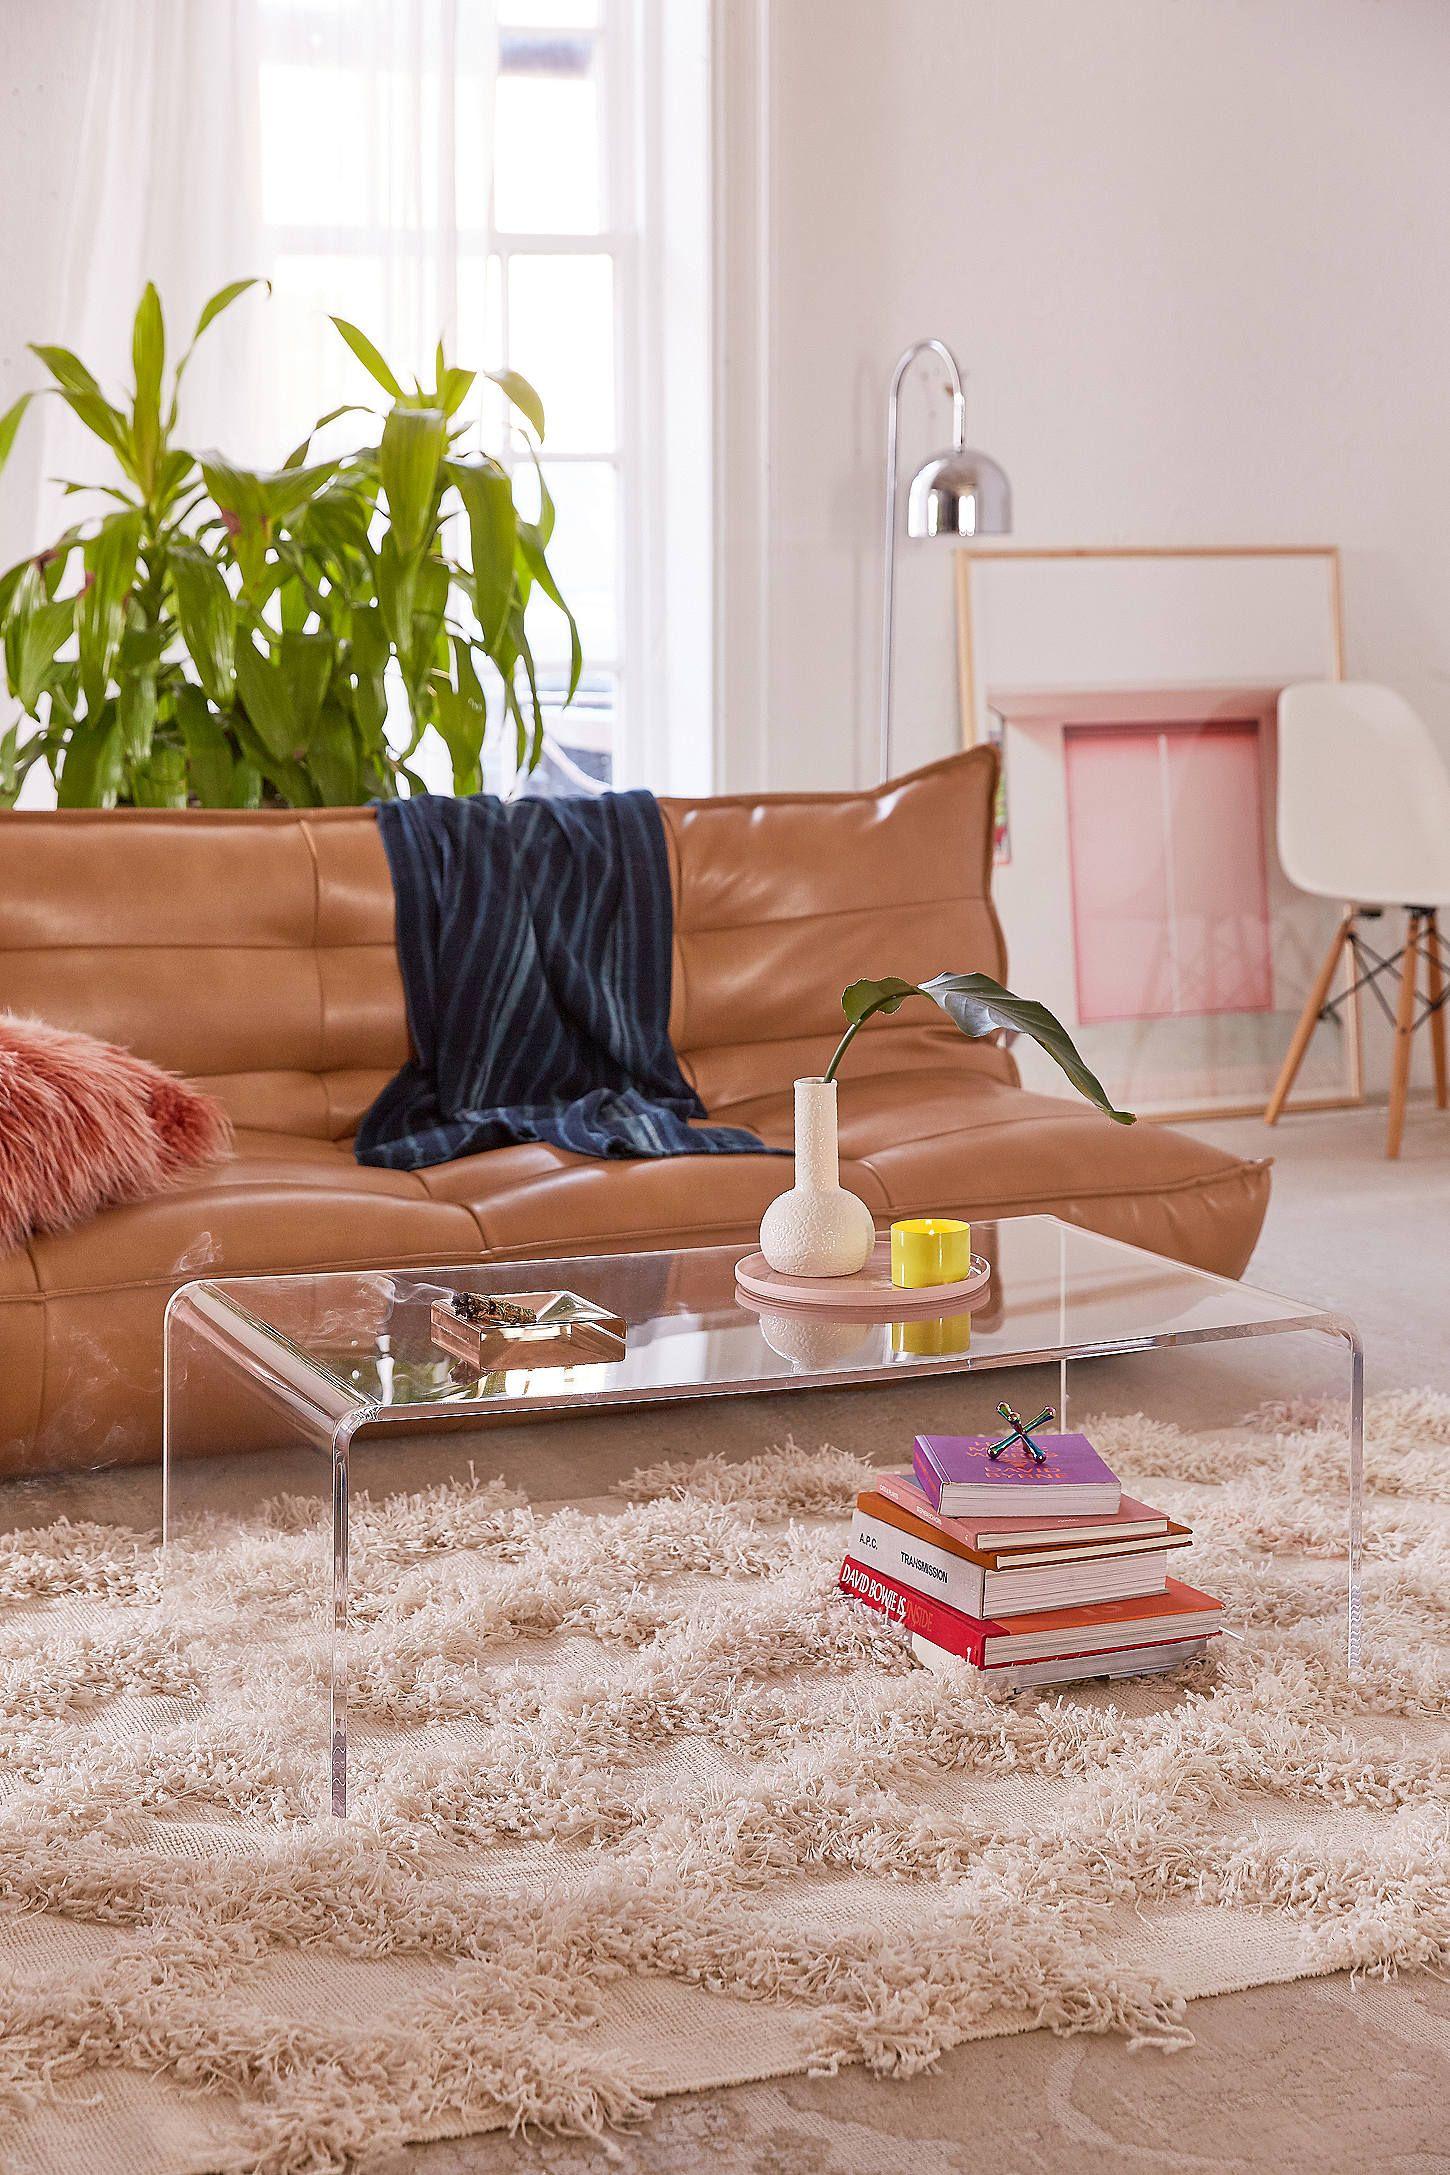 Miotto acrylic curve coffee table in interior decor ideas